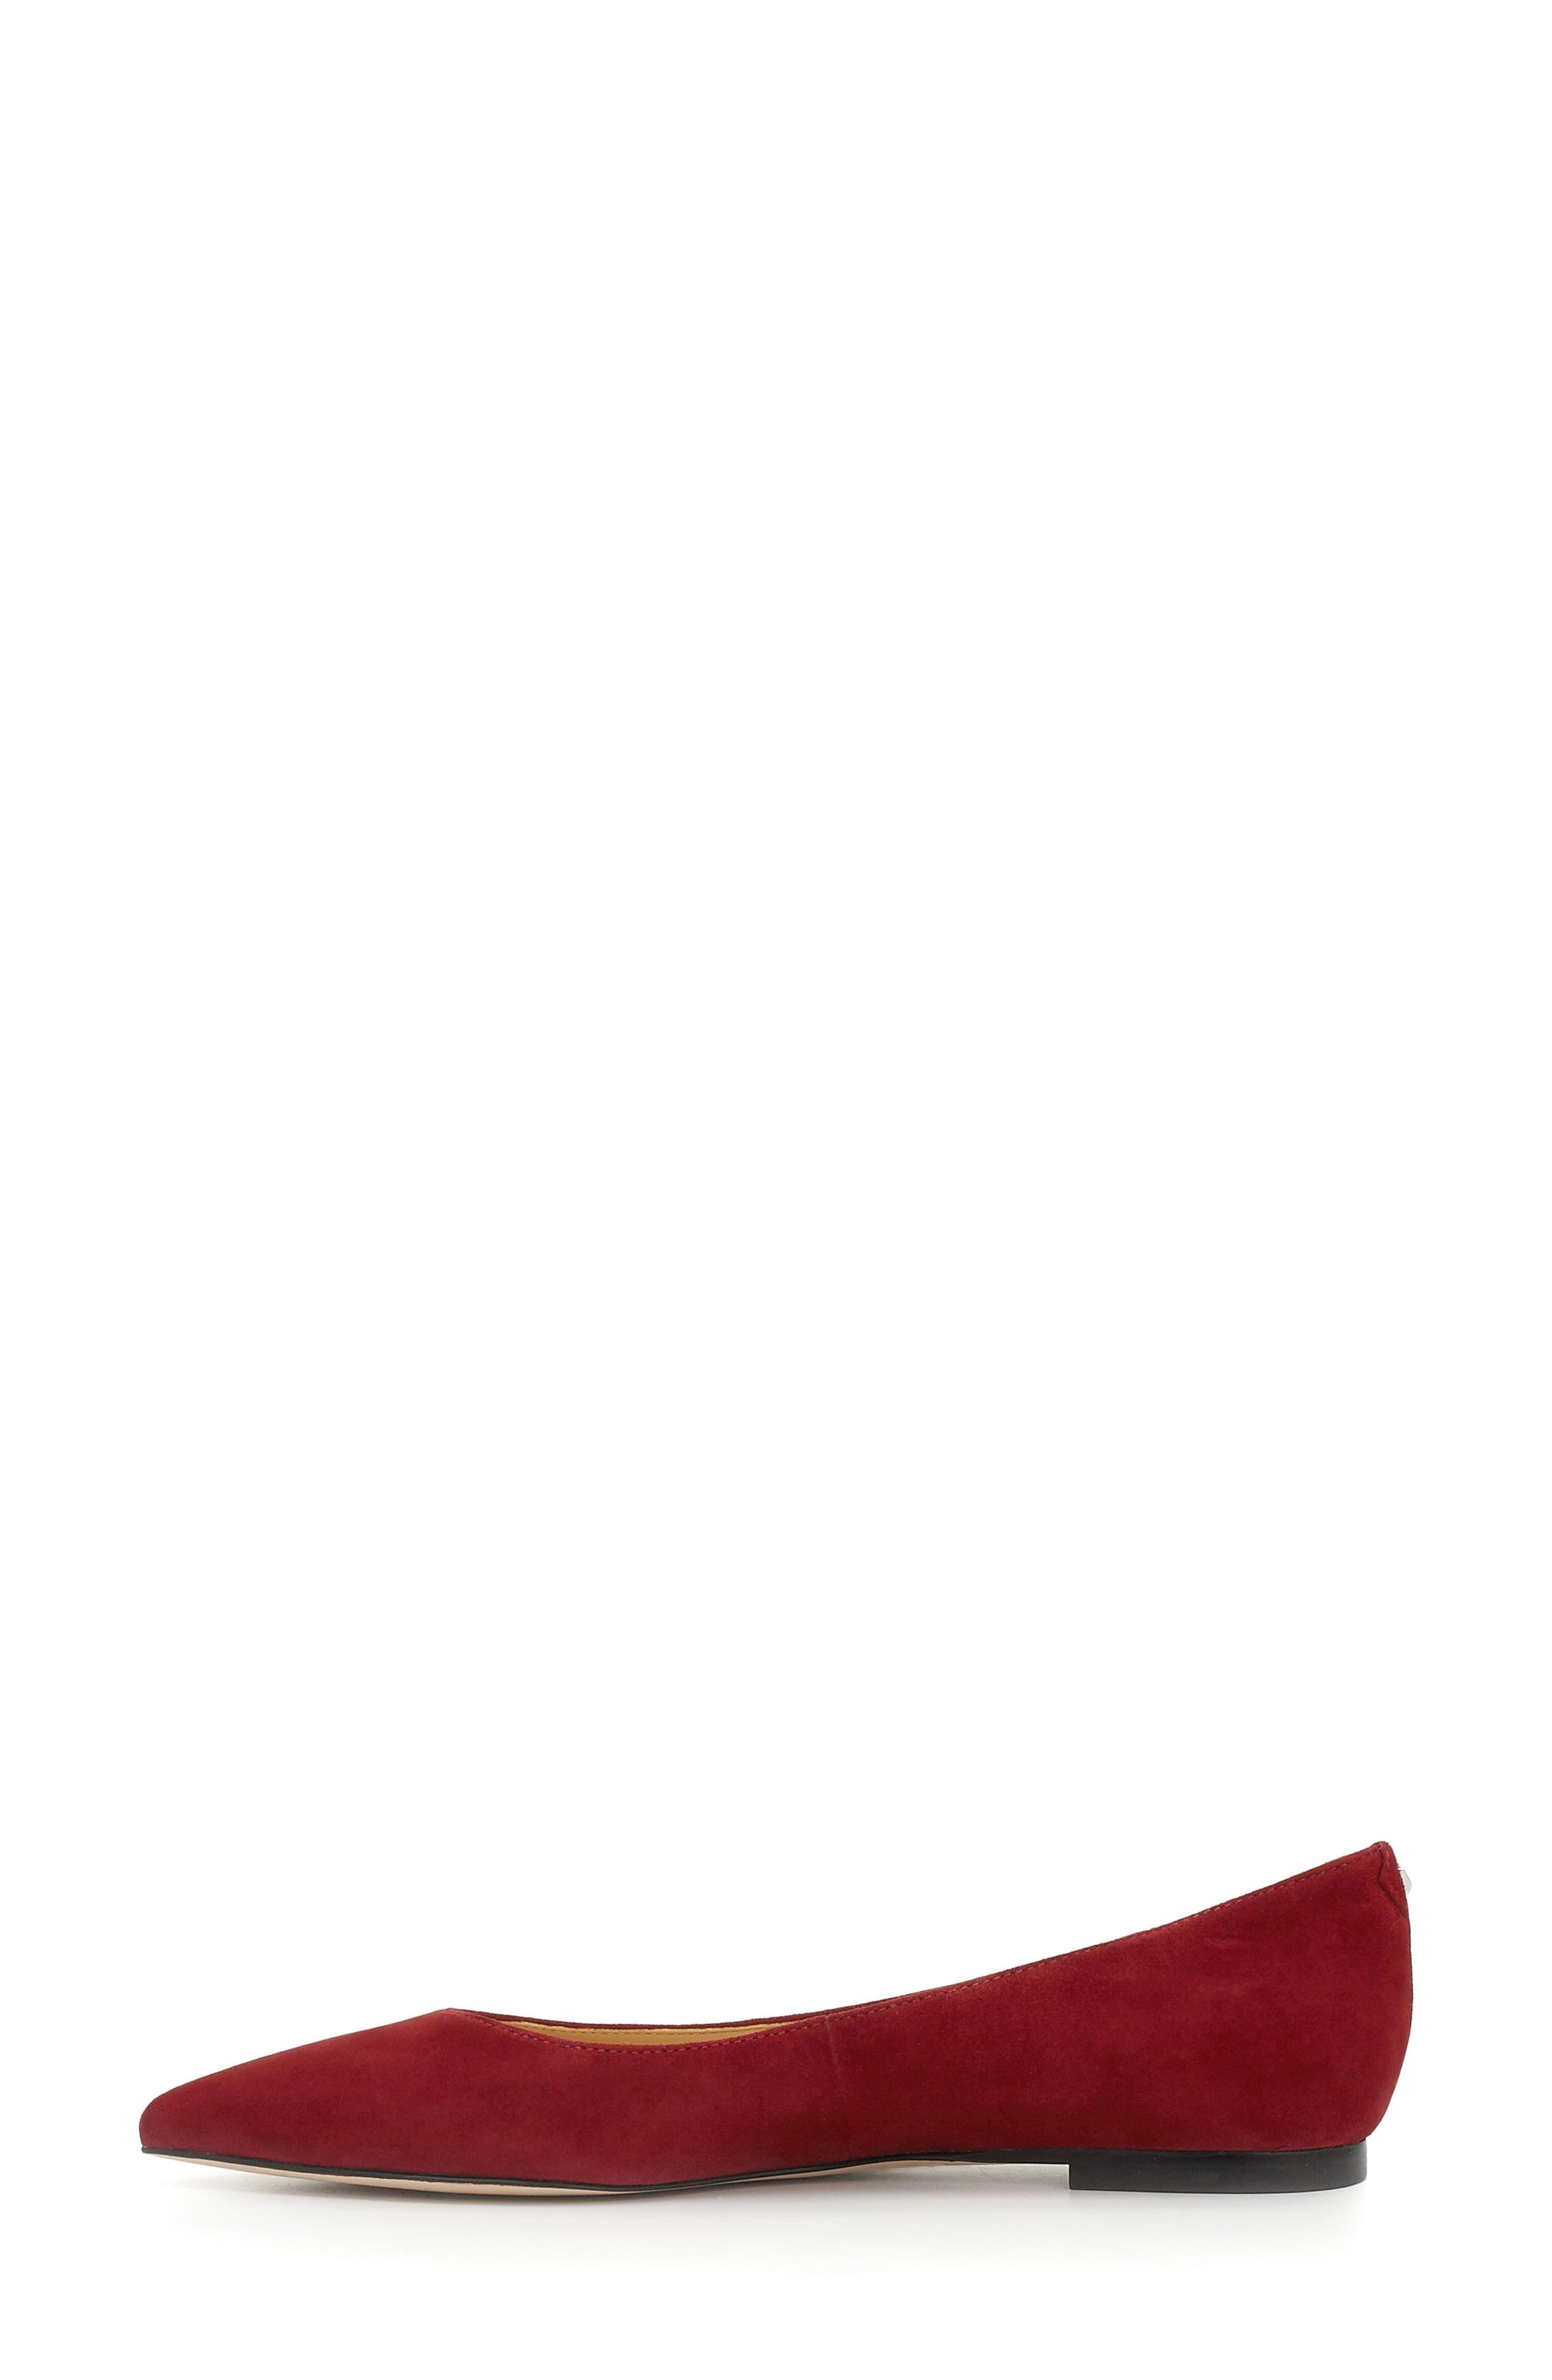 Rae Pointy Toe Flat,                             Alternate thumbnail 2, color,                             602